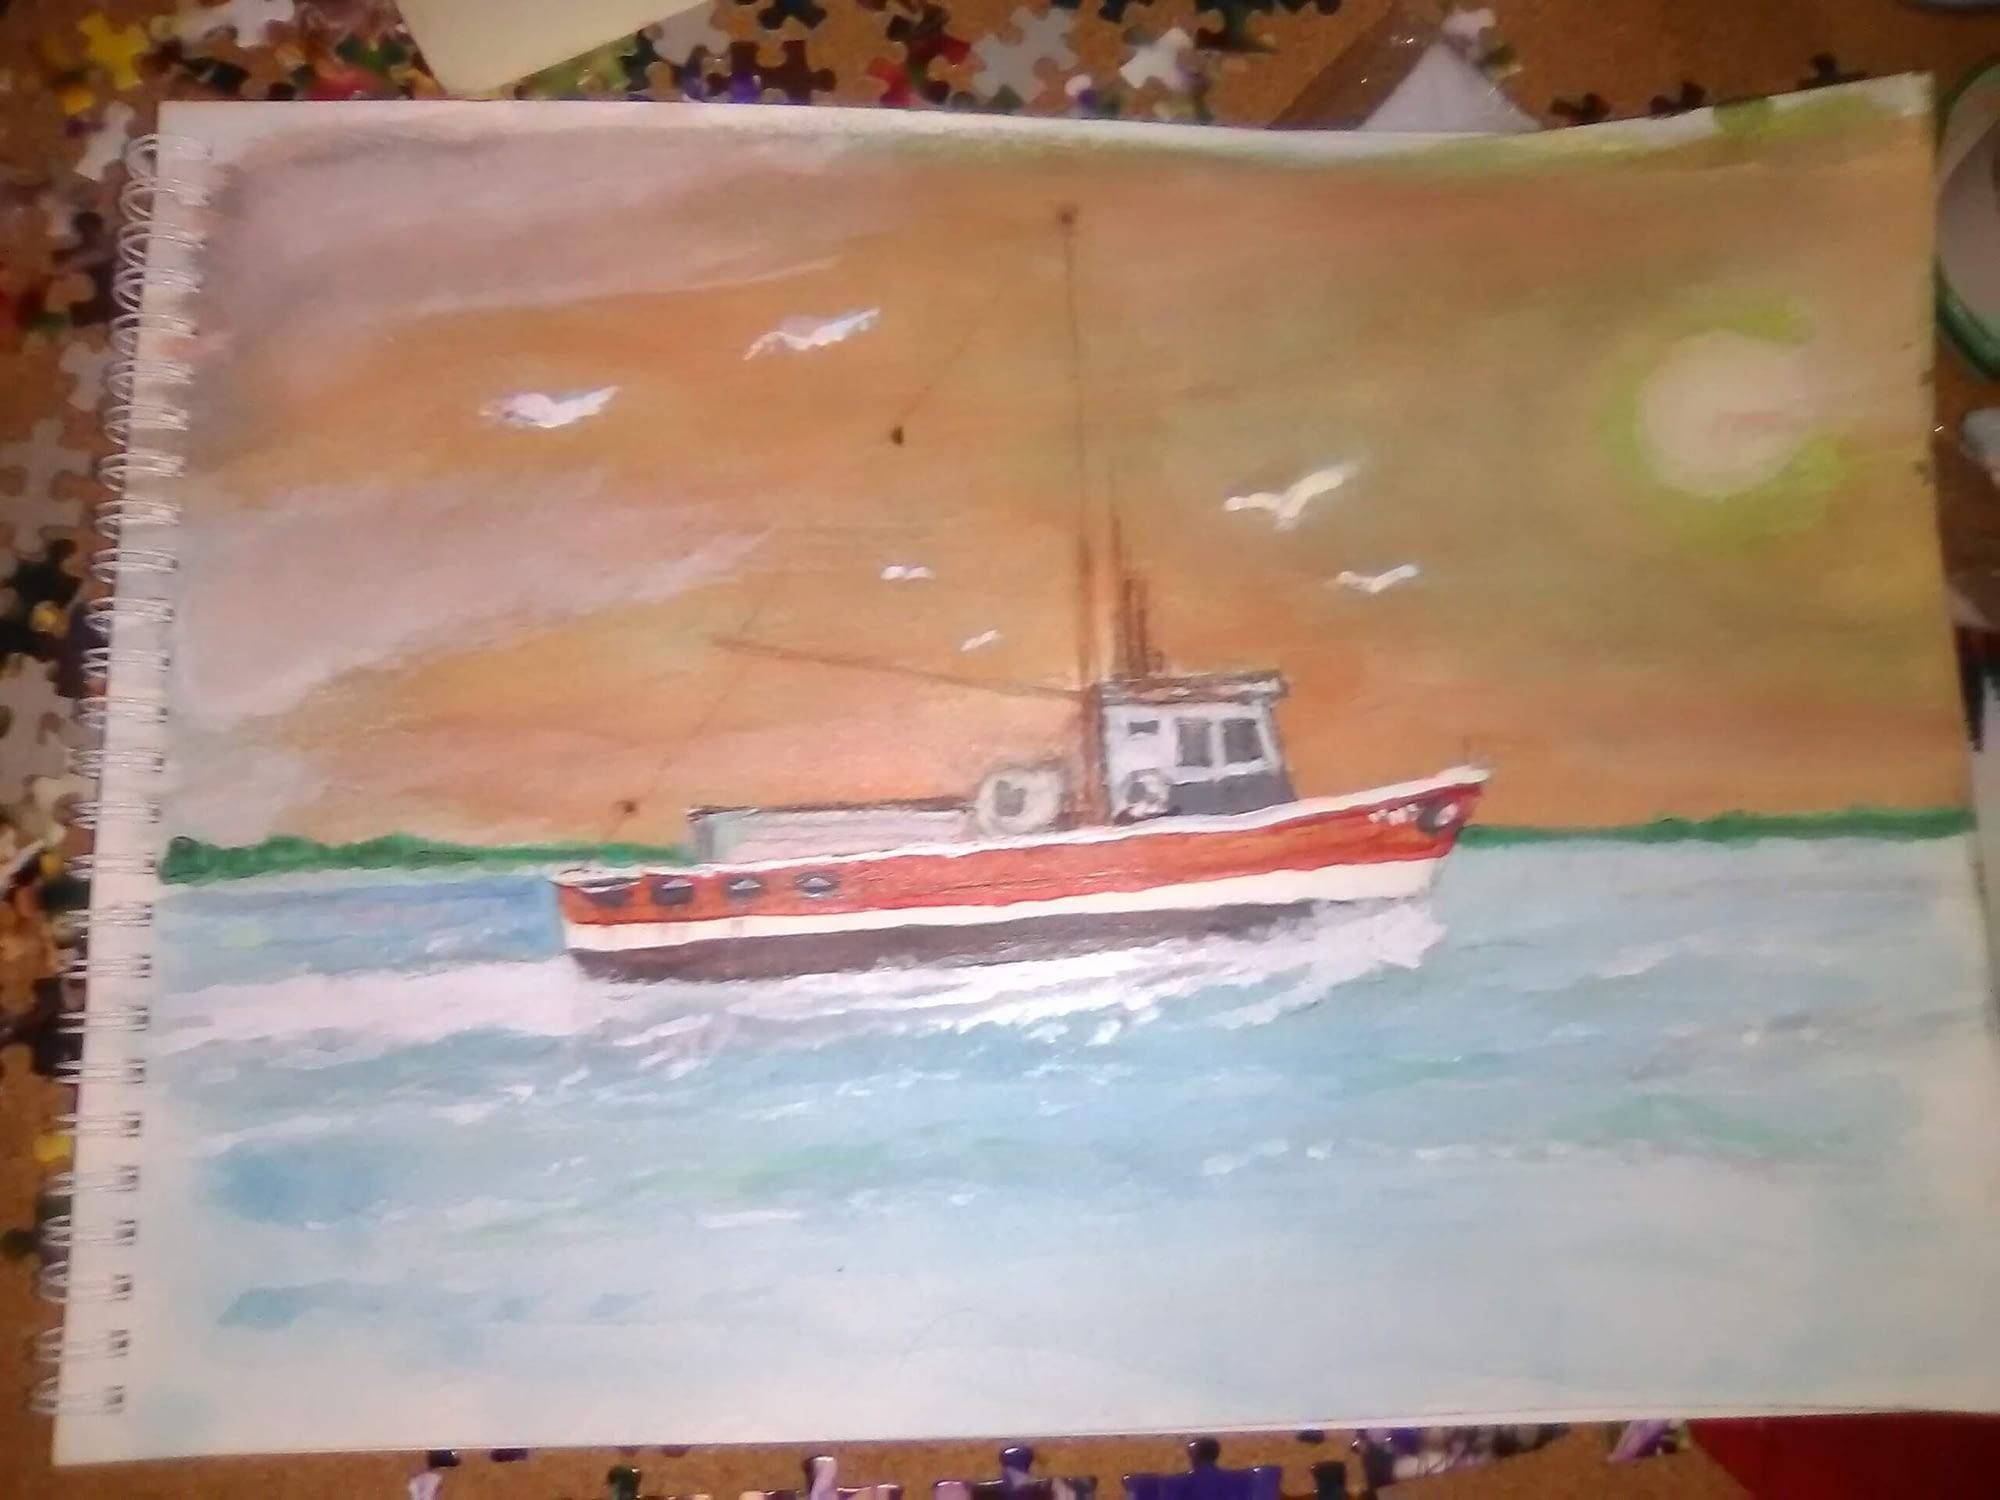 trawler - watercolor exercise #3